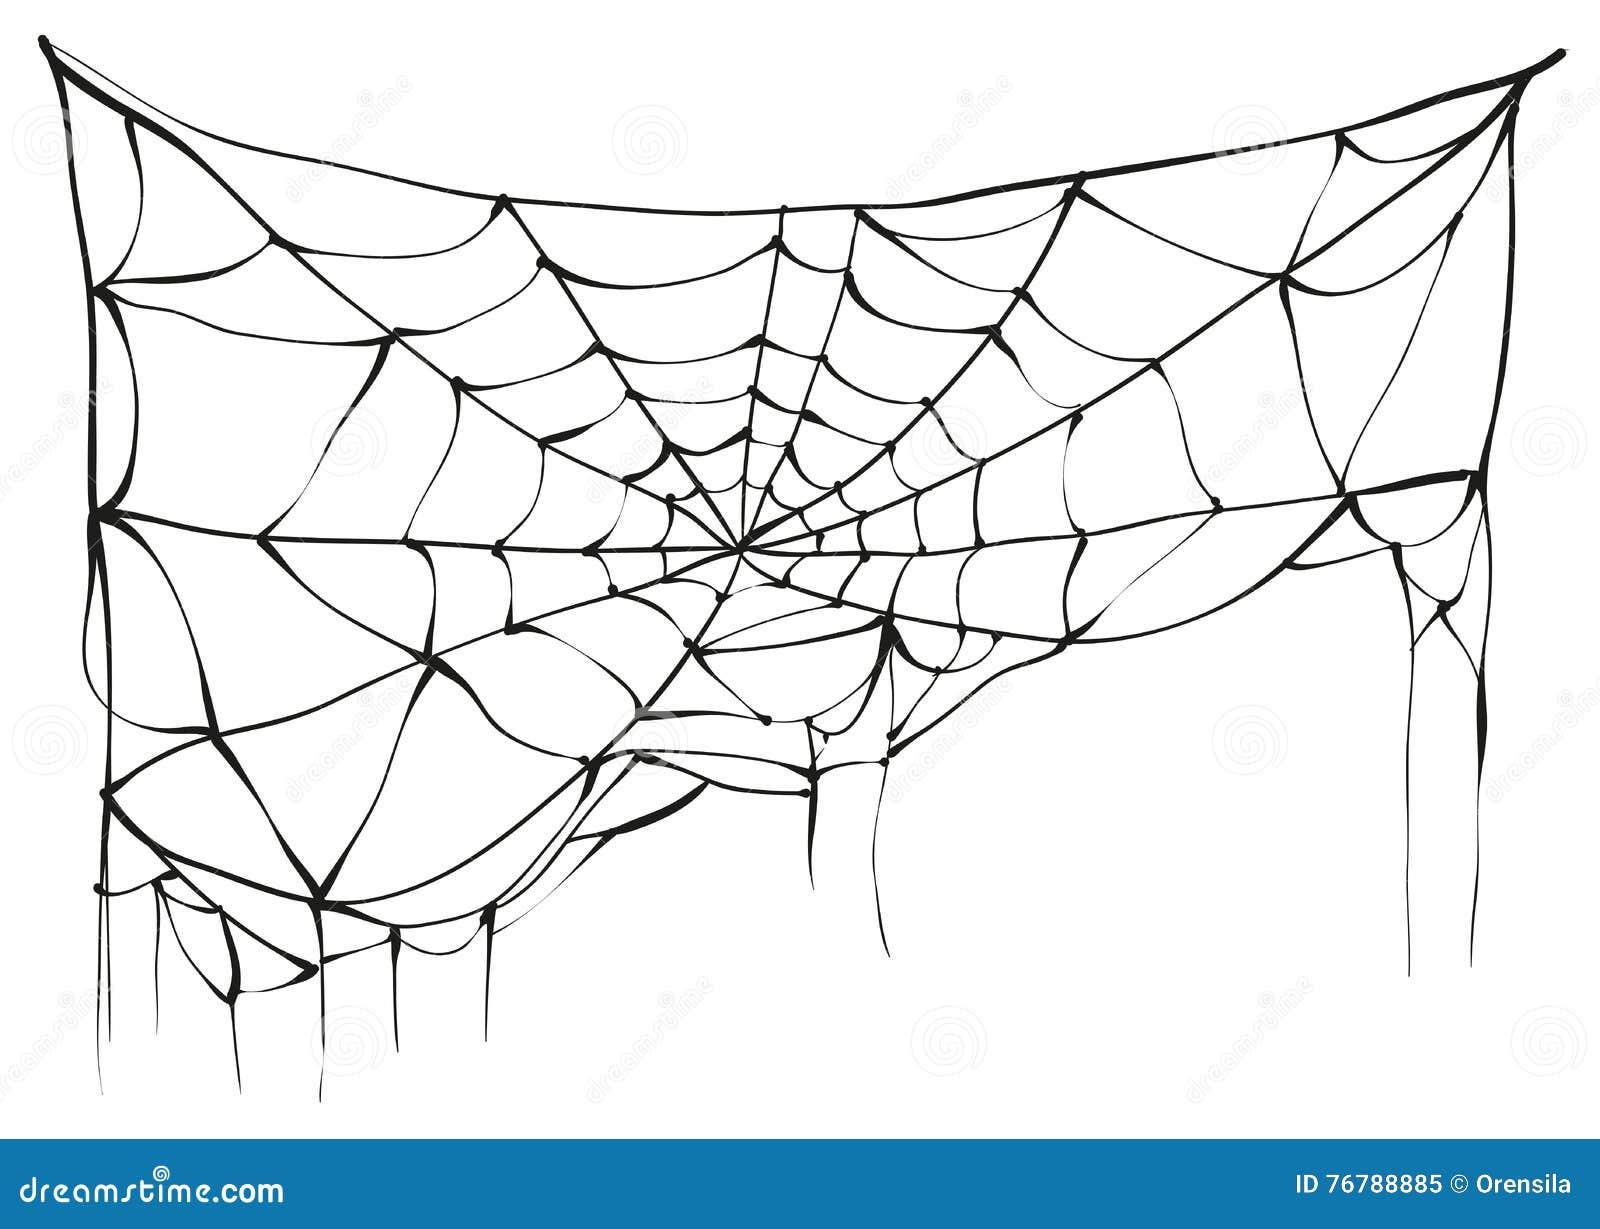 Gescheurd spinneweb op witte achtergrond